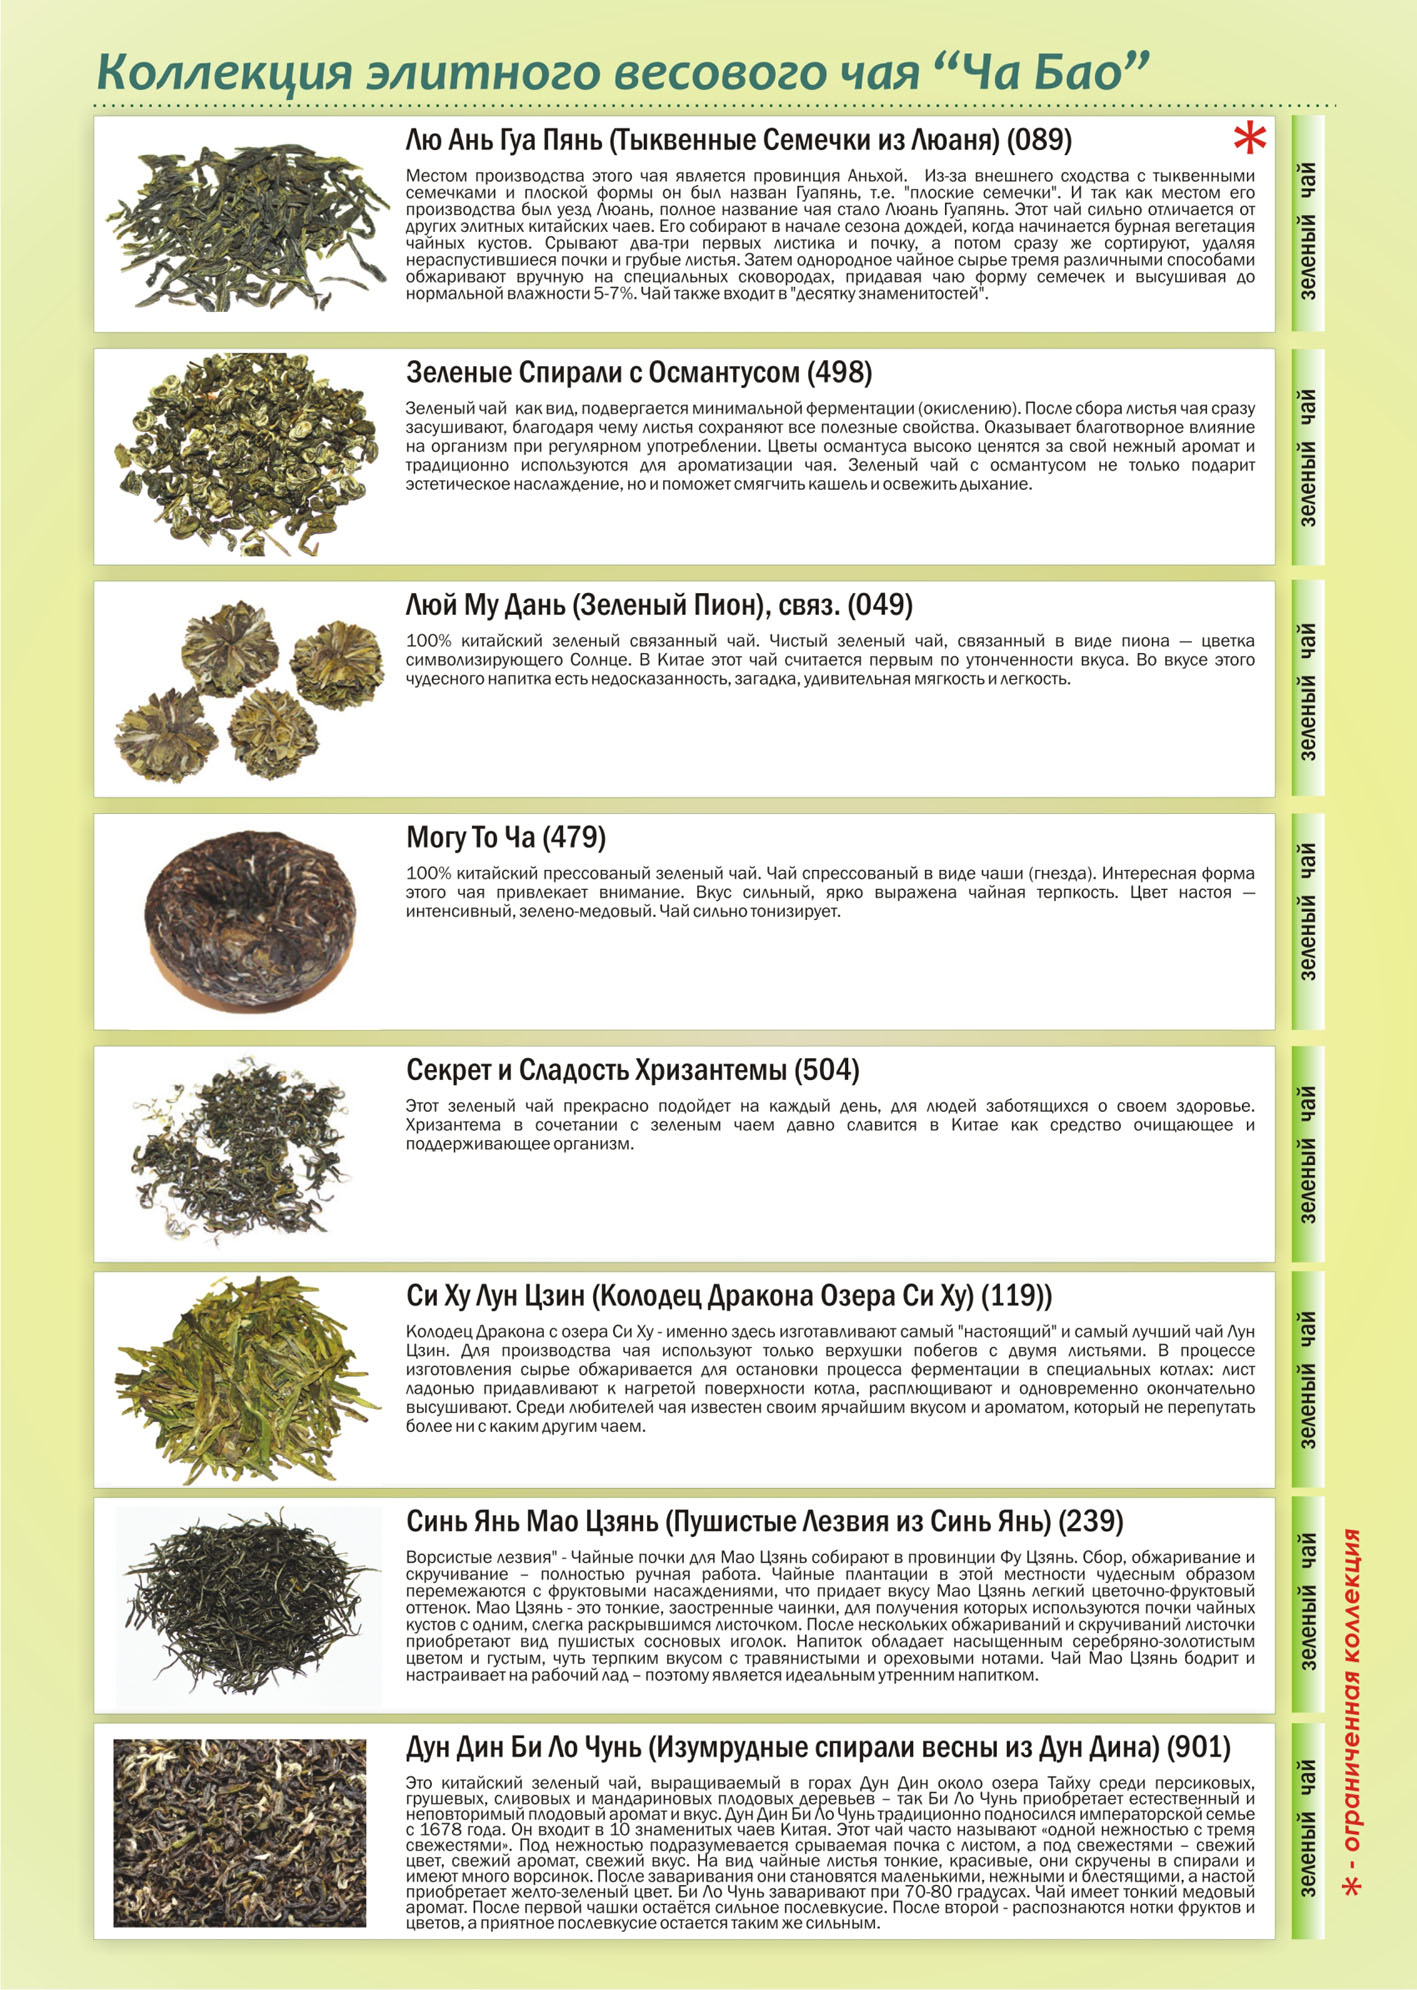 Сорта чая. улунский чай. фуцзянь, уишань - teaterra | teaterra